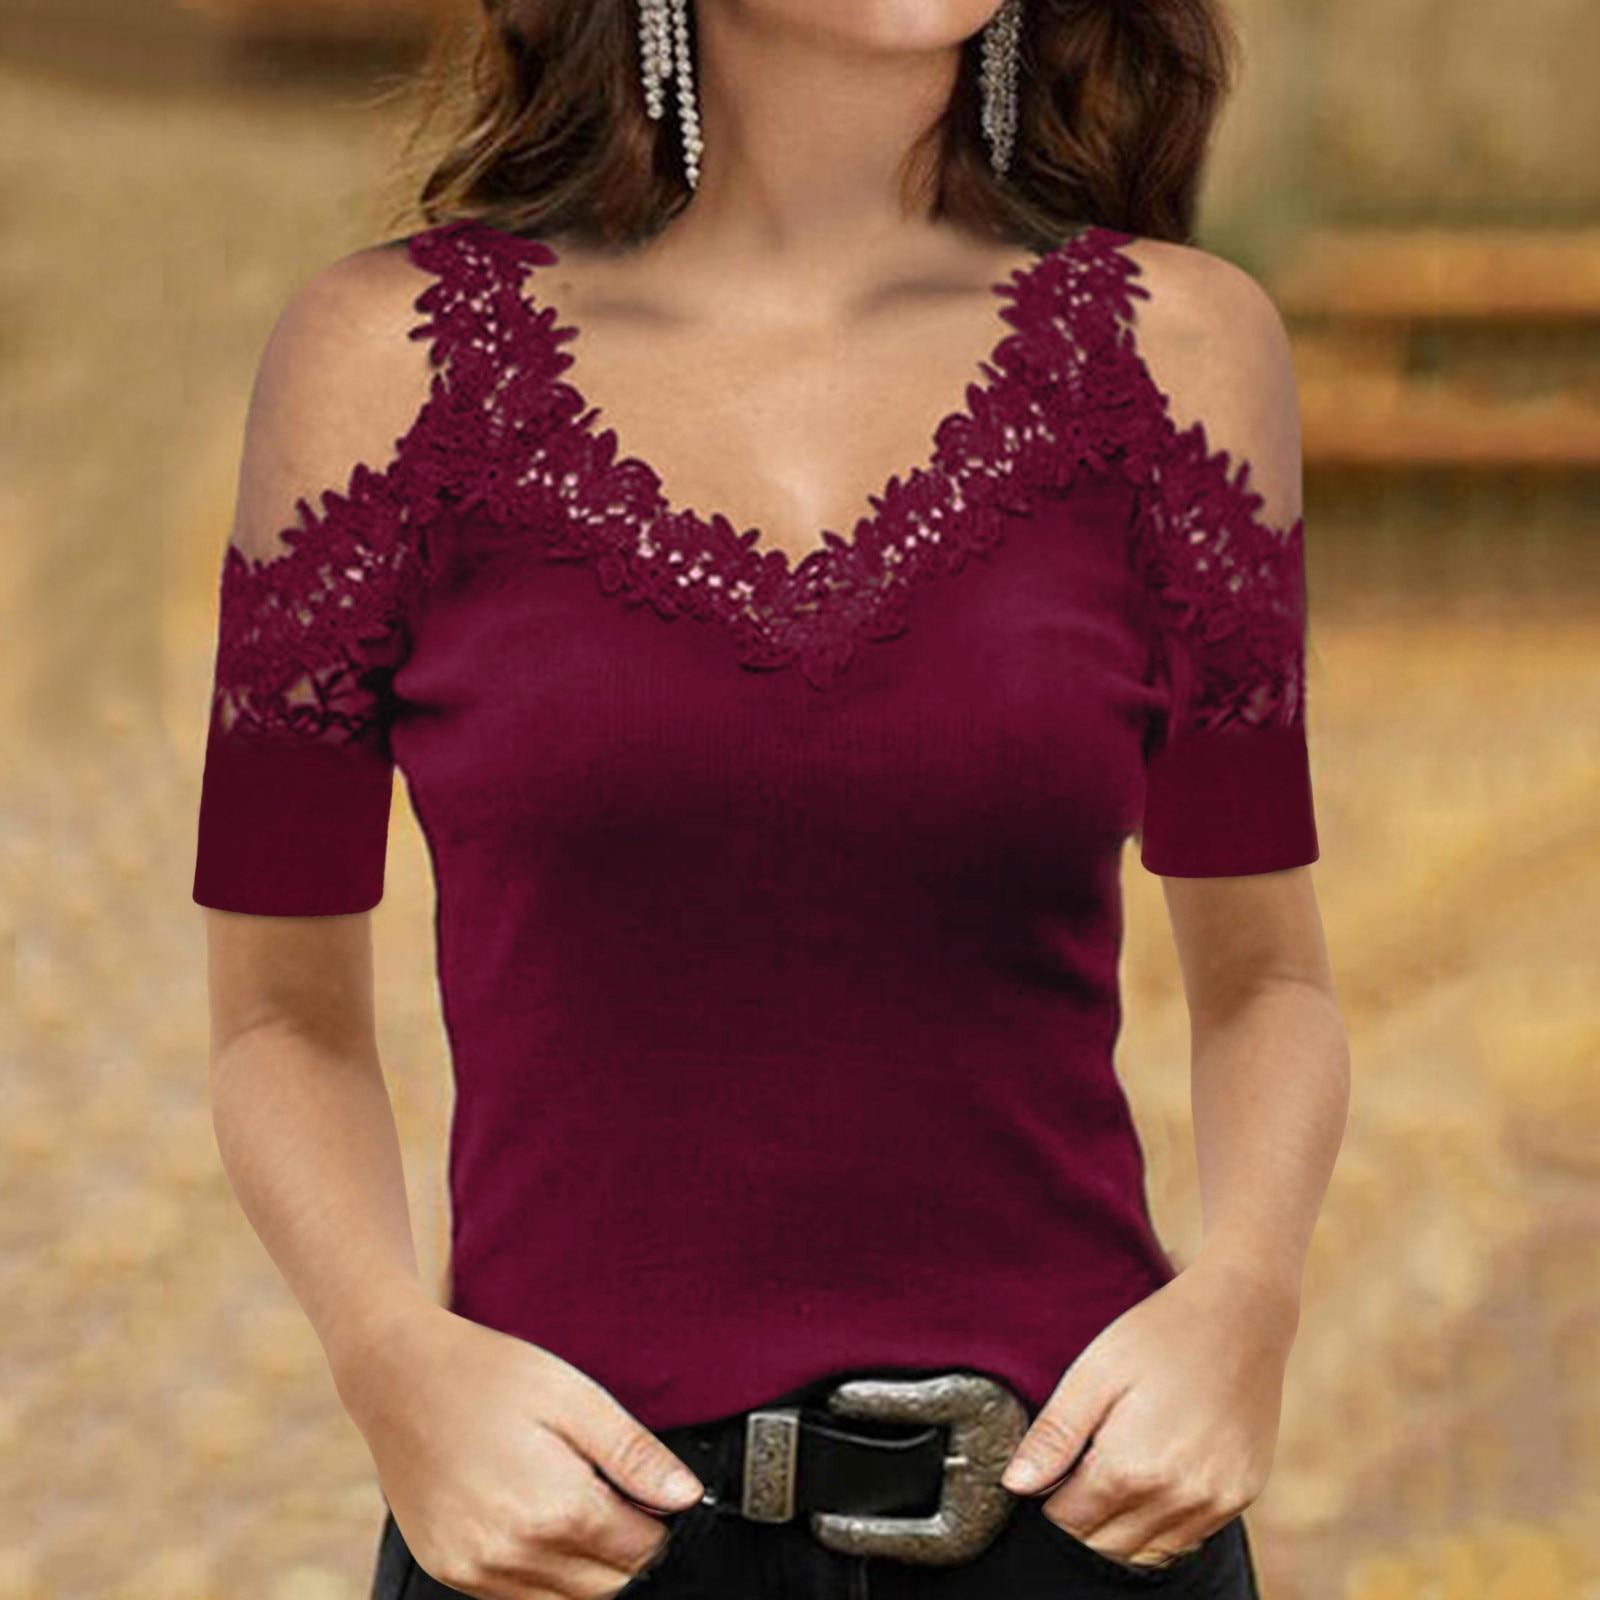 Fashion Off Shoulder Blouses Women Summer Lace Patchwork Shirts Casual Short Sleeved V-neck Pullover Tops bluzki damskie